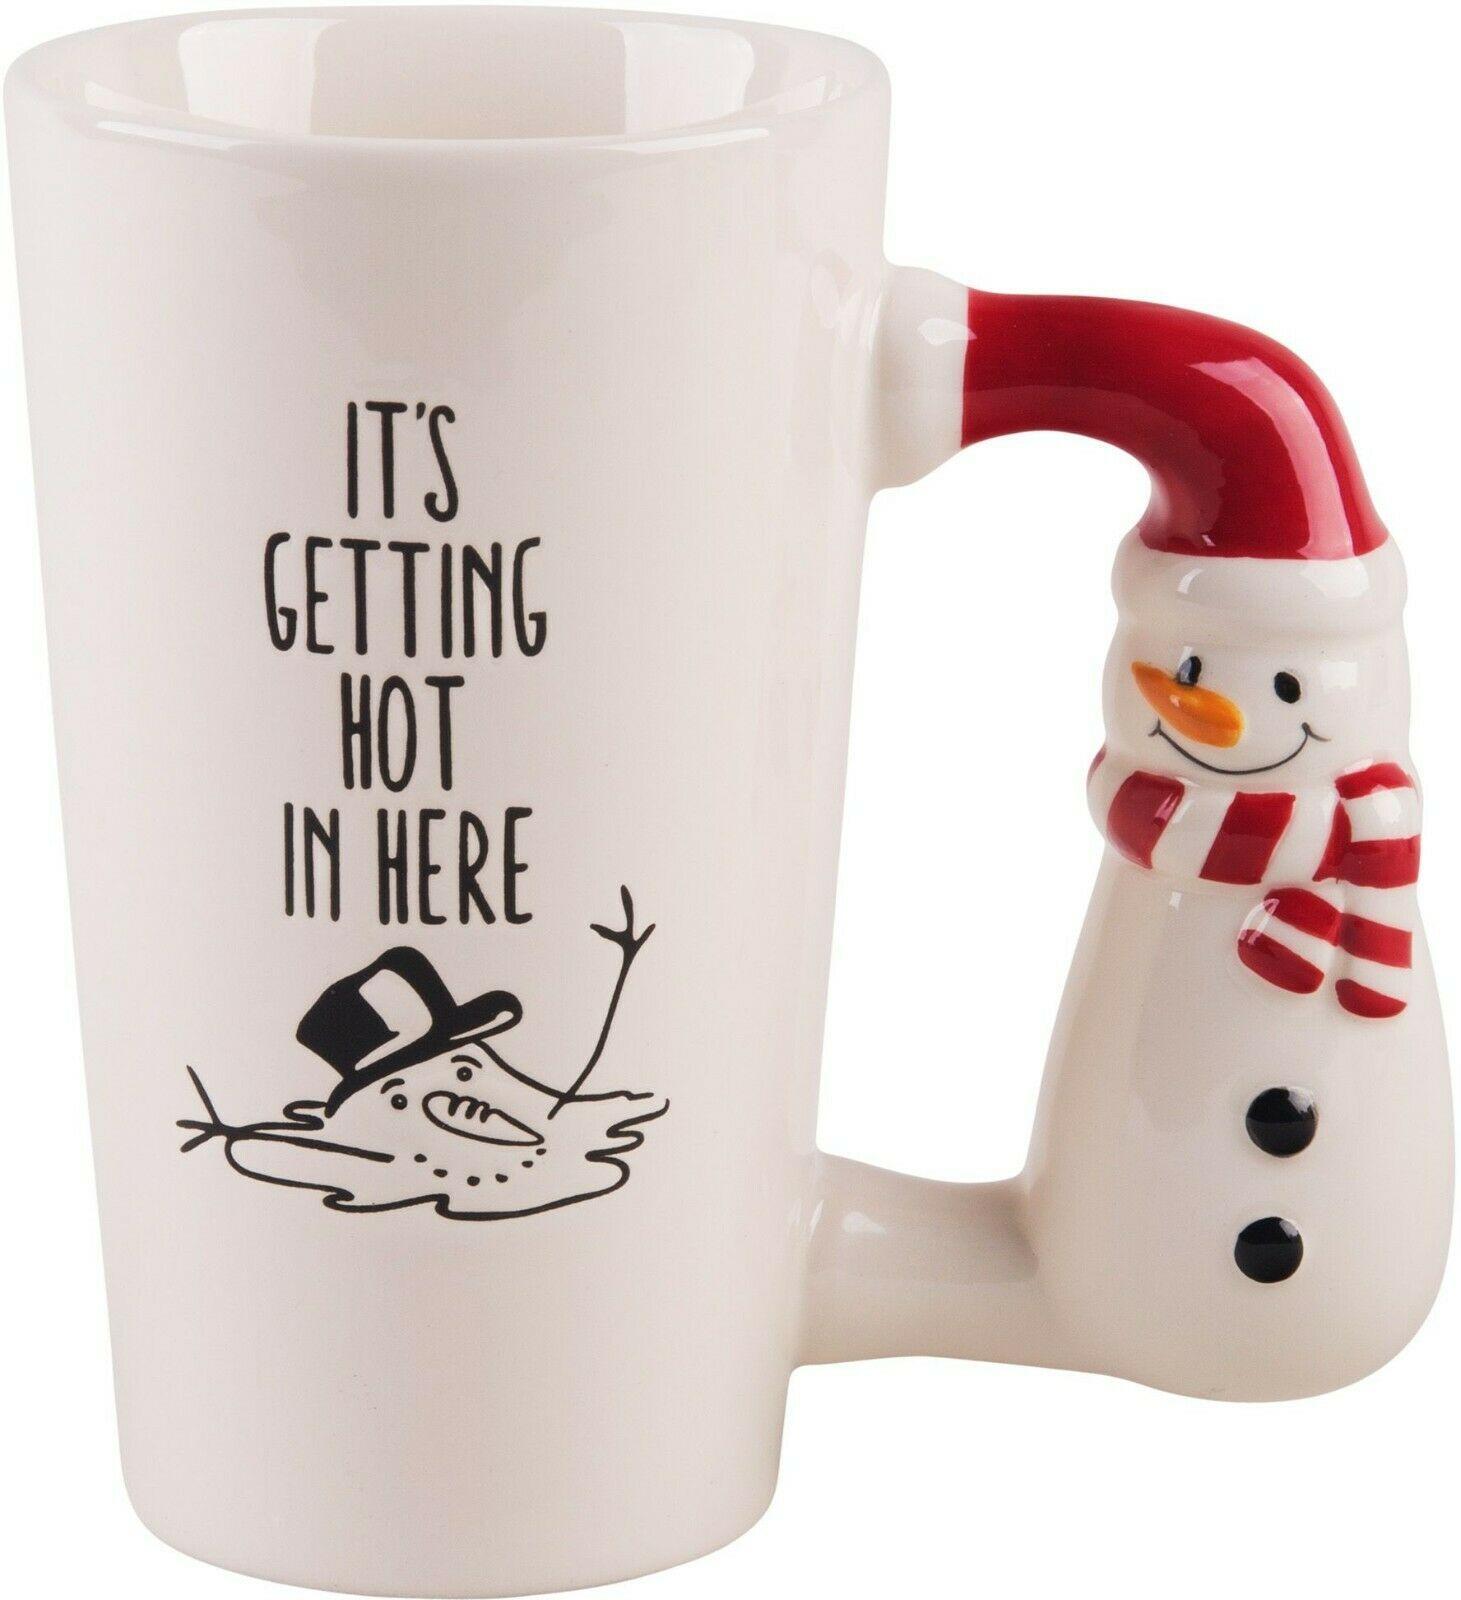 4 Assorted Holiday 3d Handle 17 Oz Latte Mug Words Design By Home Essentials Ebay In 2020 Latte Mugs Mugs Latte